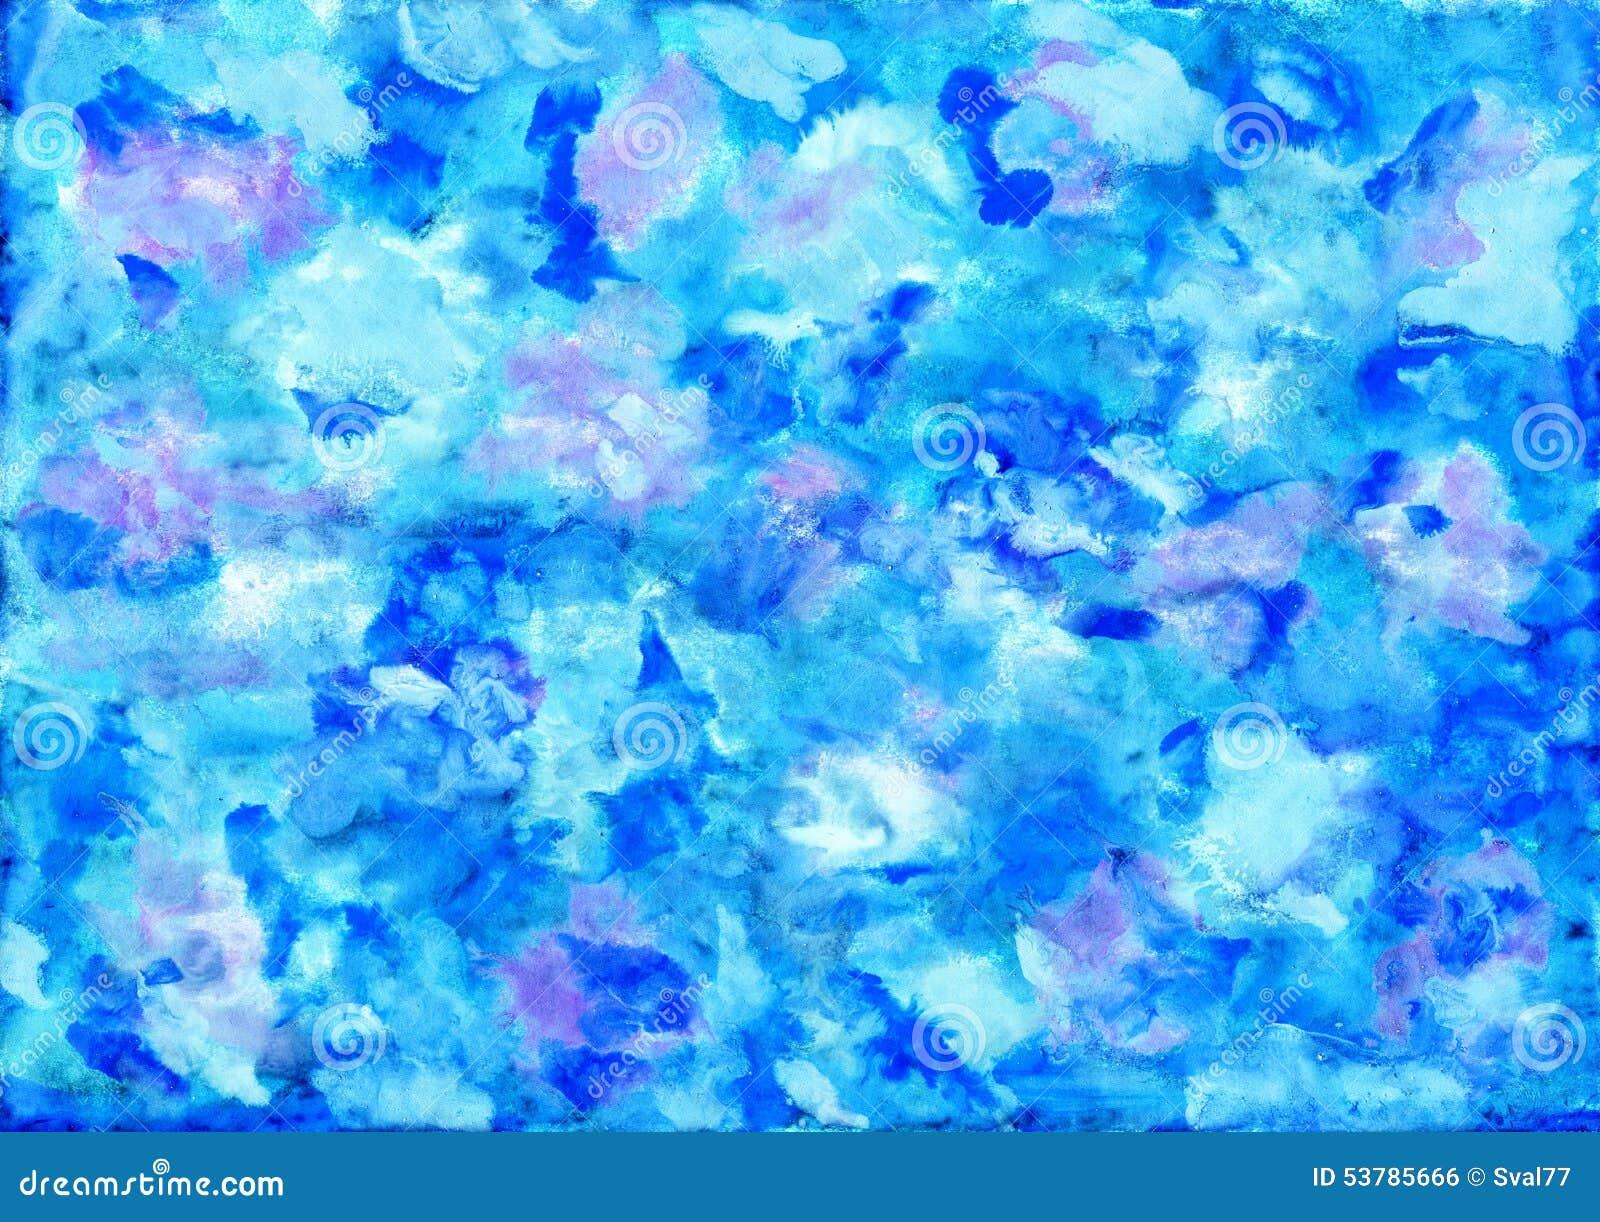 Akwarela abstrakcyjna tło